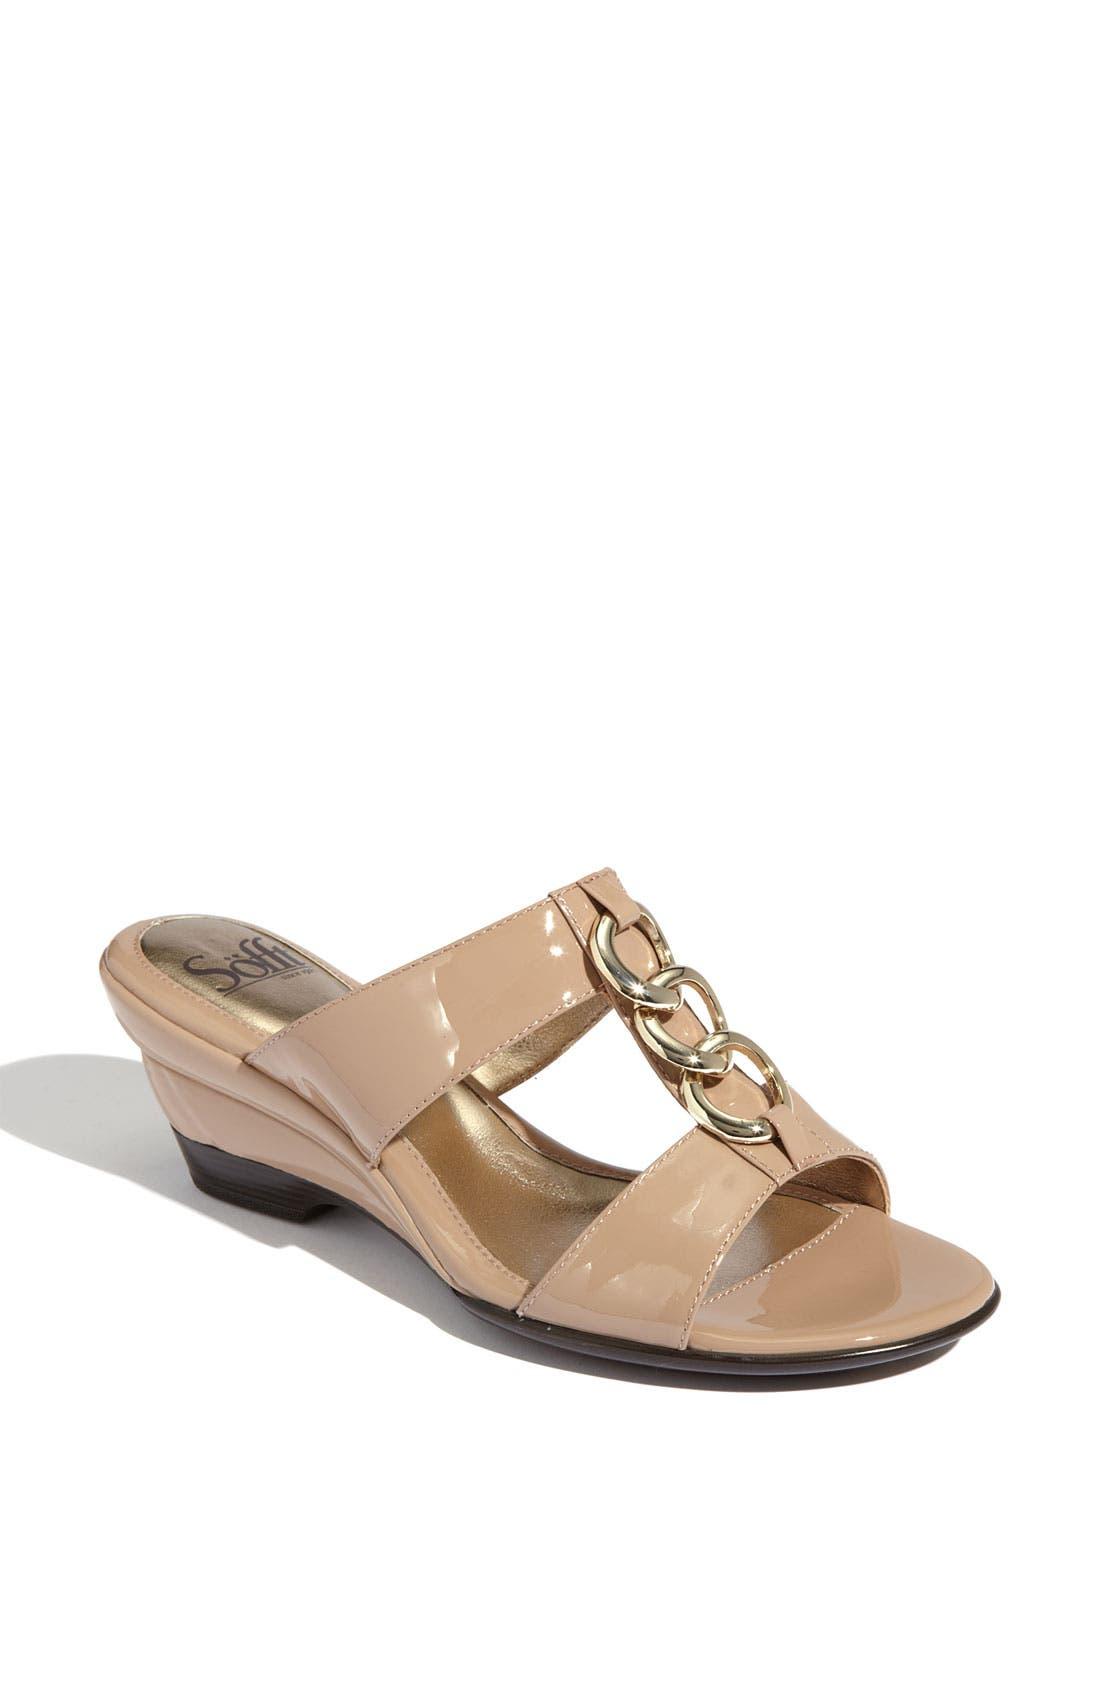 Alternate Image 1 Selected - Söfft 'Ibiza' Sandal